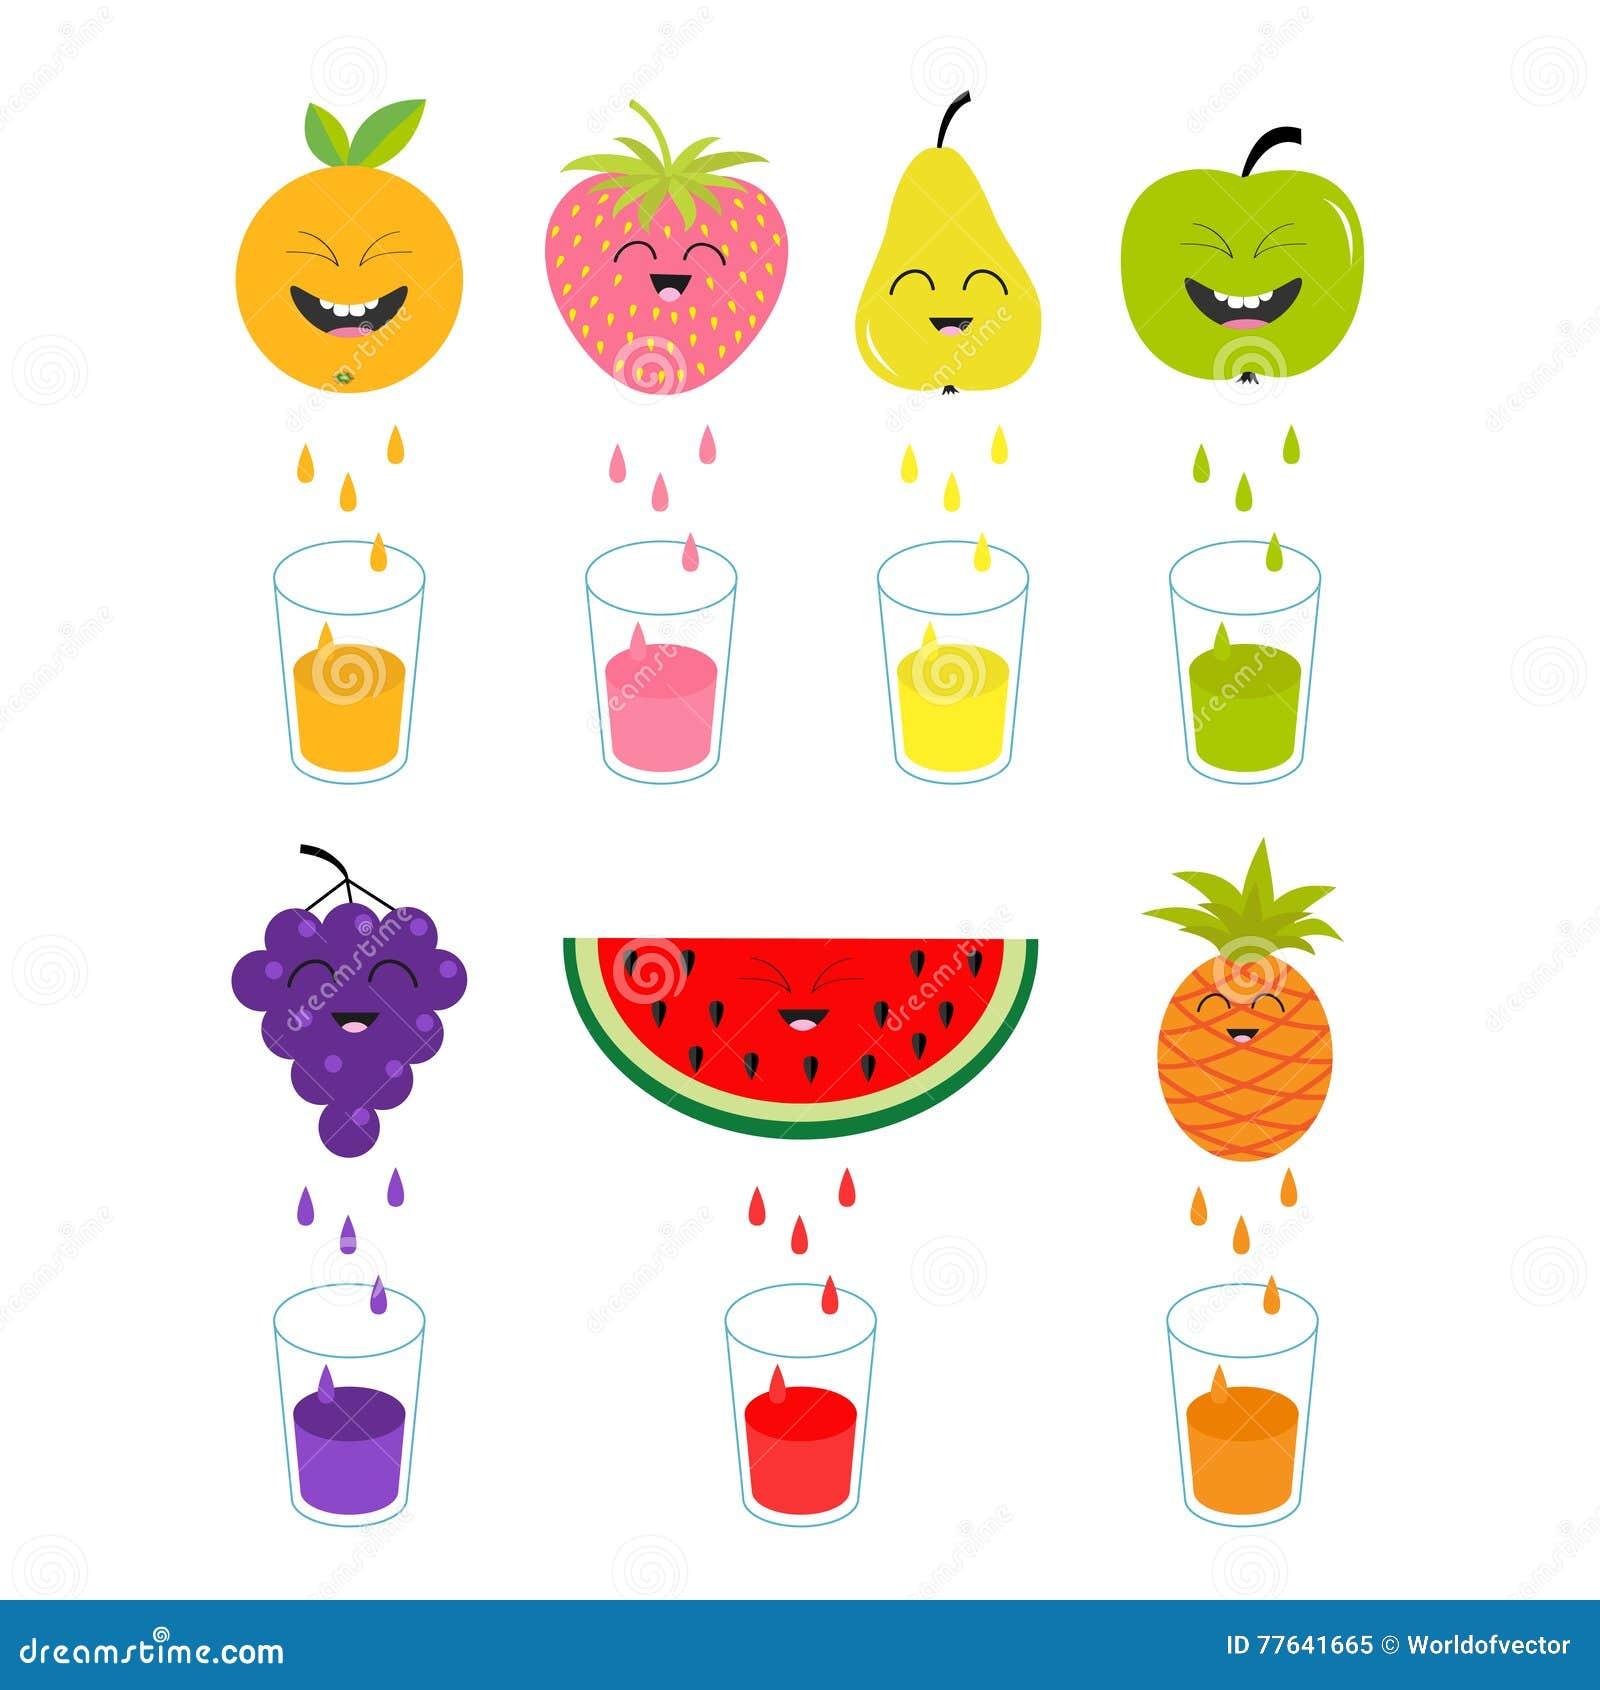 verse sap en glazen apple aardbei peer sinaasappel